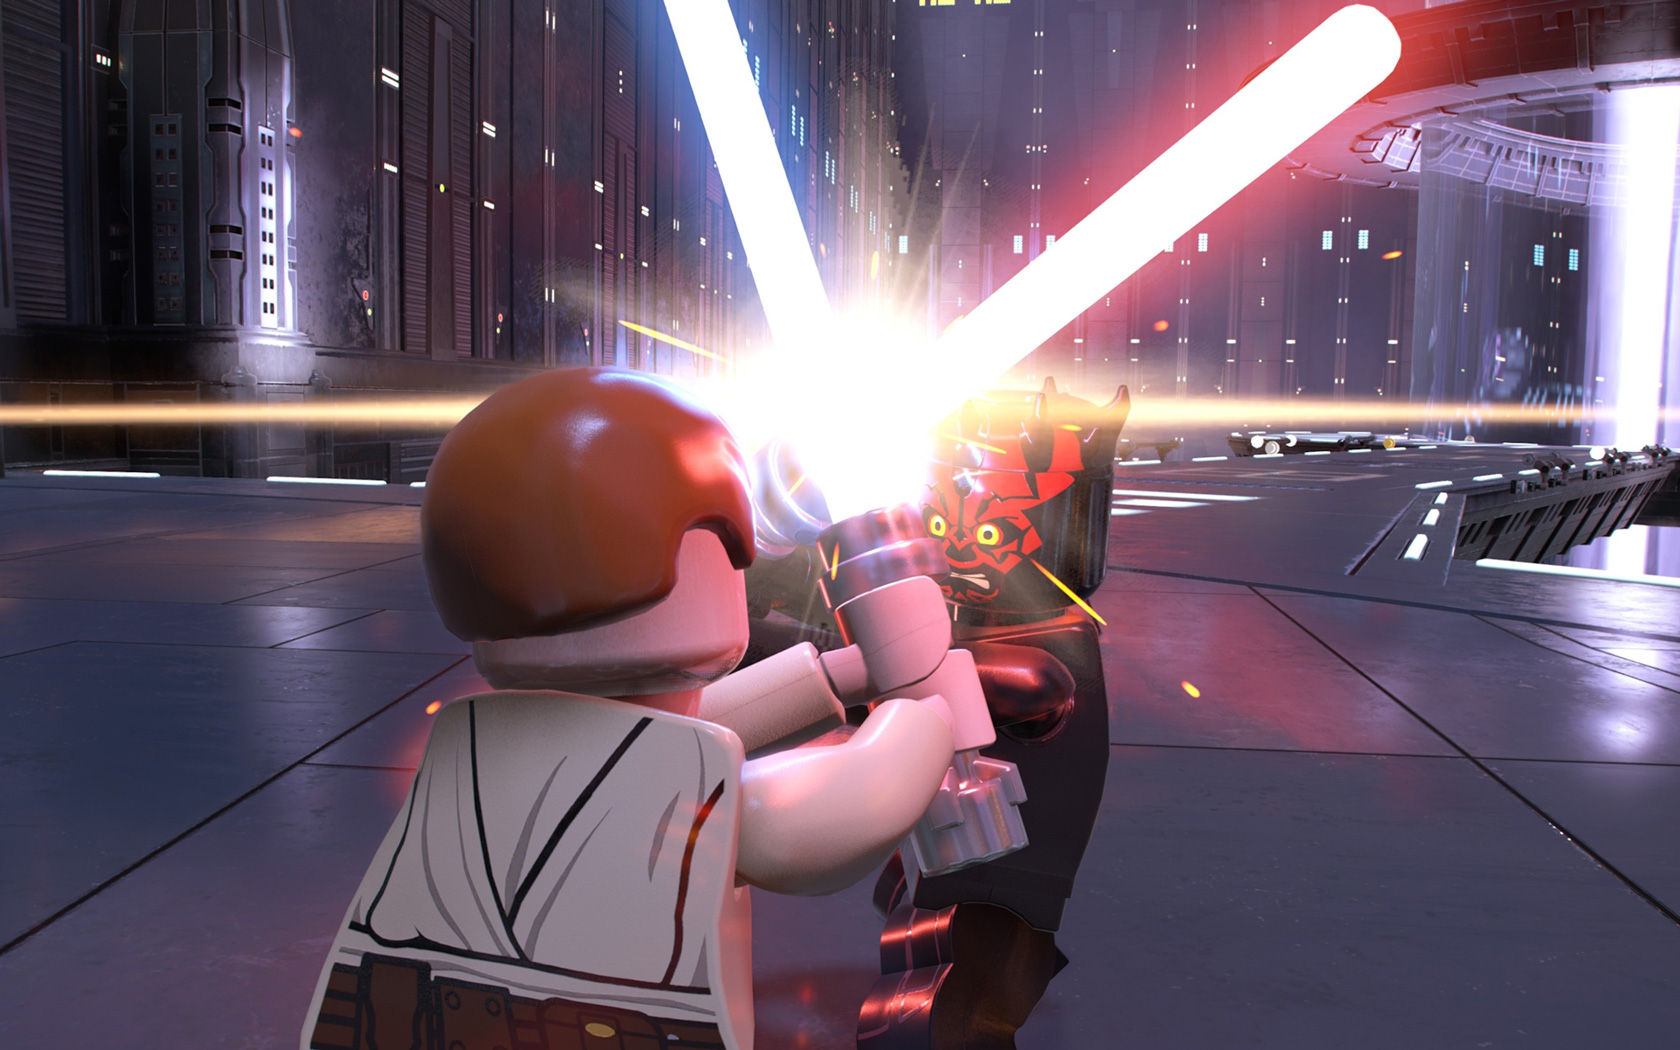 Free Lego Star Wars: The Skywalker Saga Wallpaper in 1680x1050